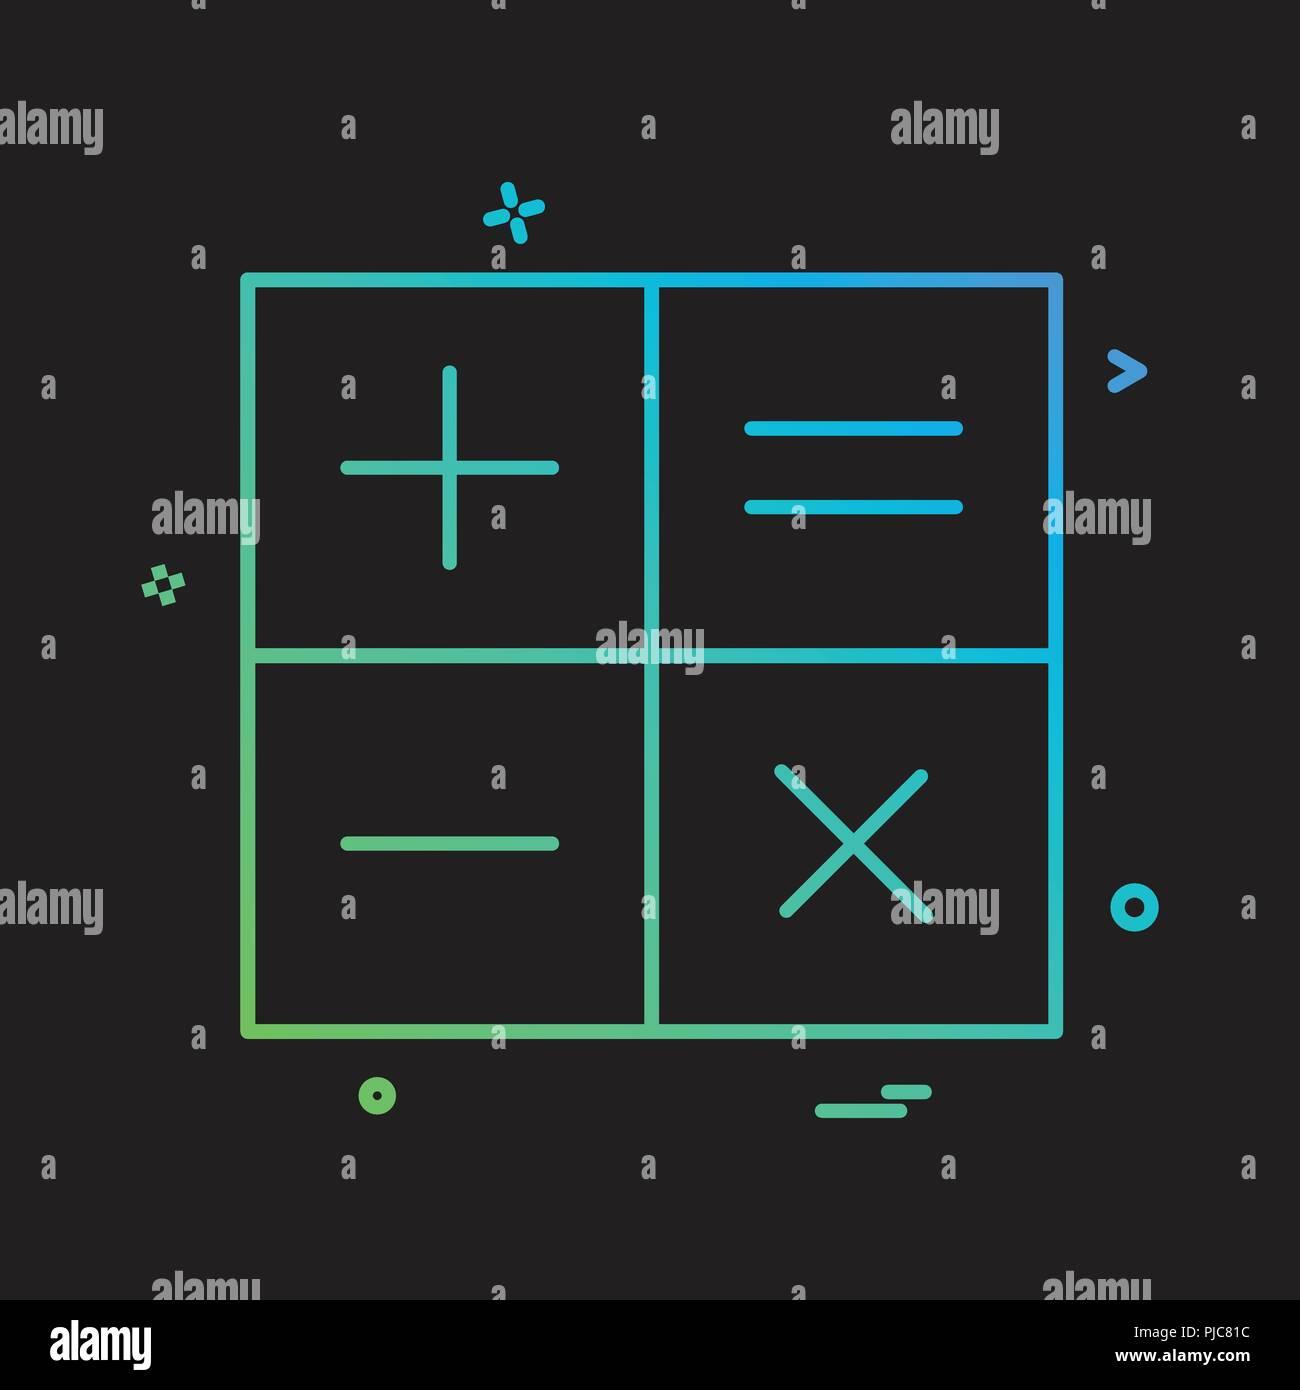 Icono calculadora matemática diseño vectorial Imagen De Stock